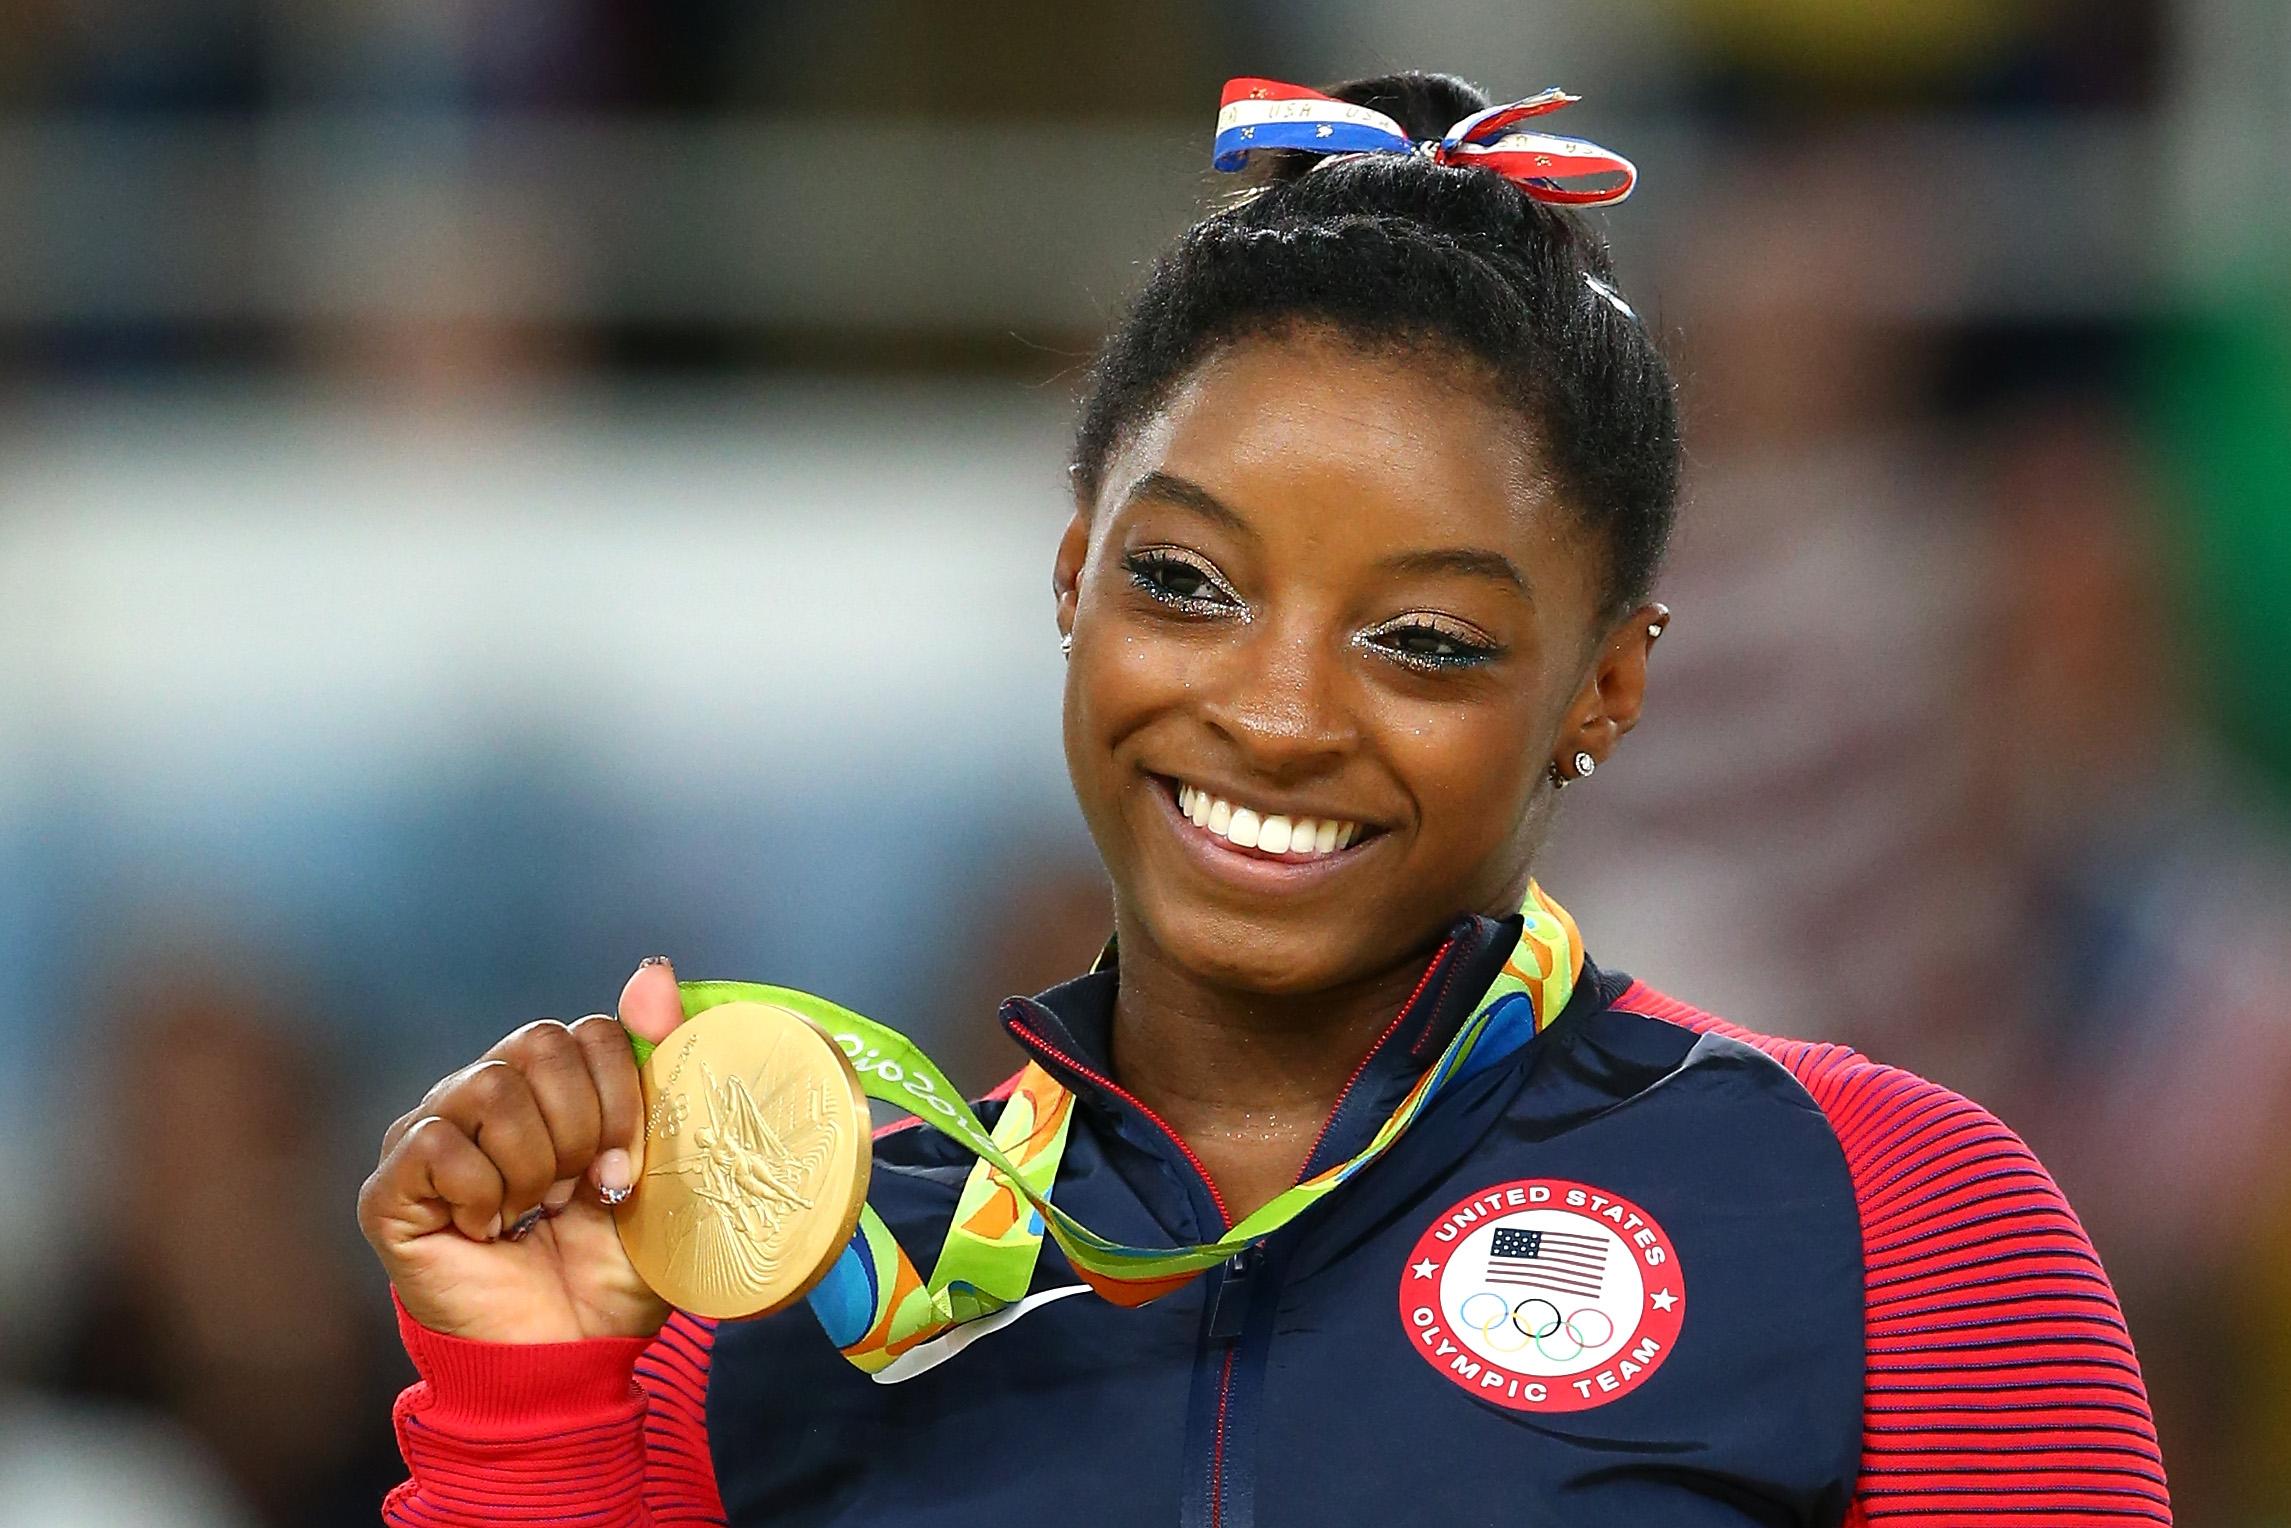 simone biles, best female athlete, espy, odds